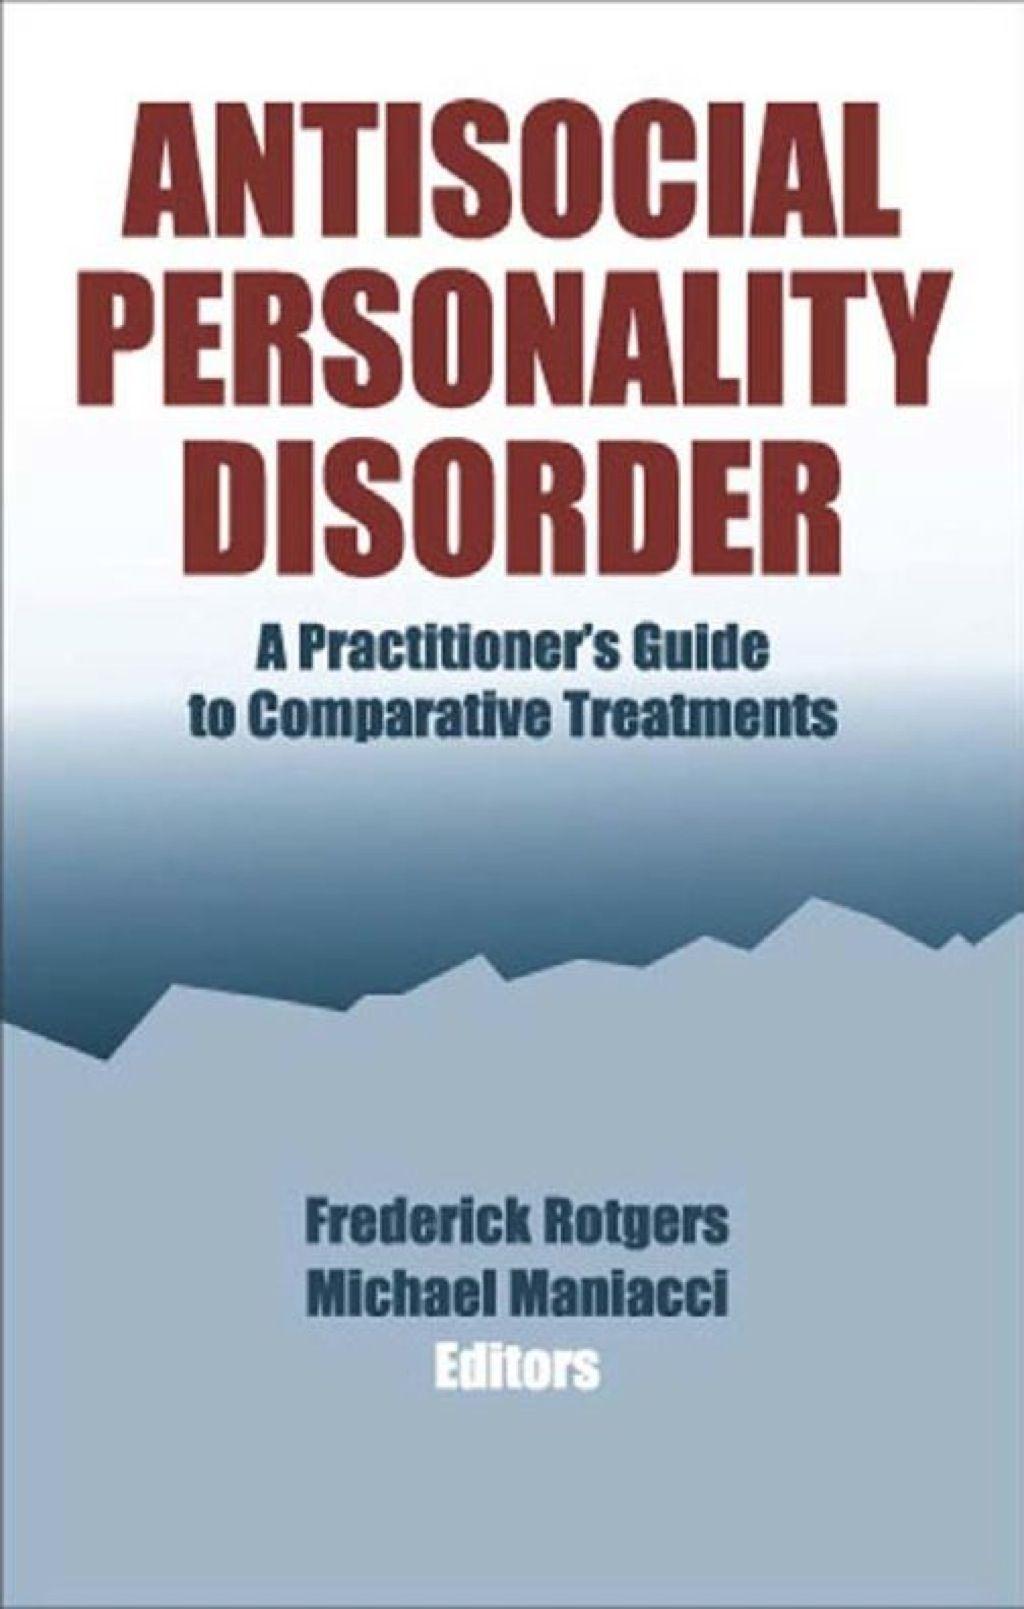 Antisocial Personality Disorder Ebook Rental